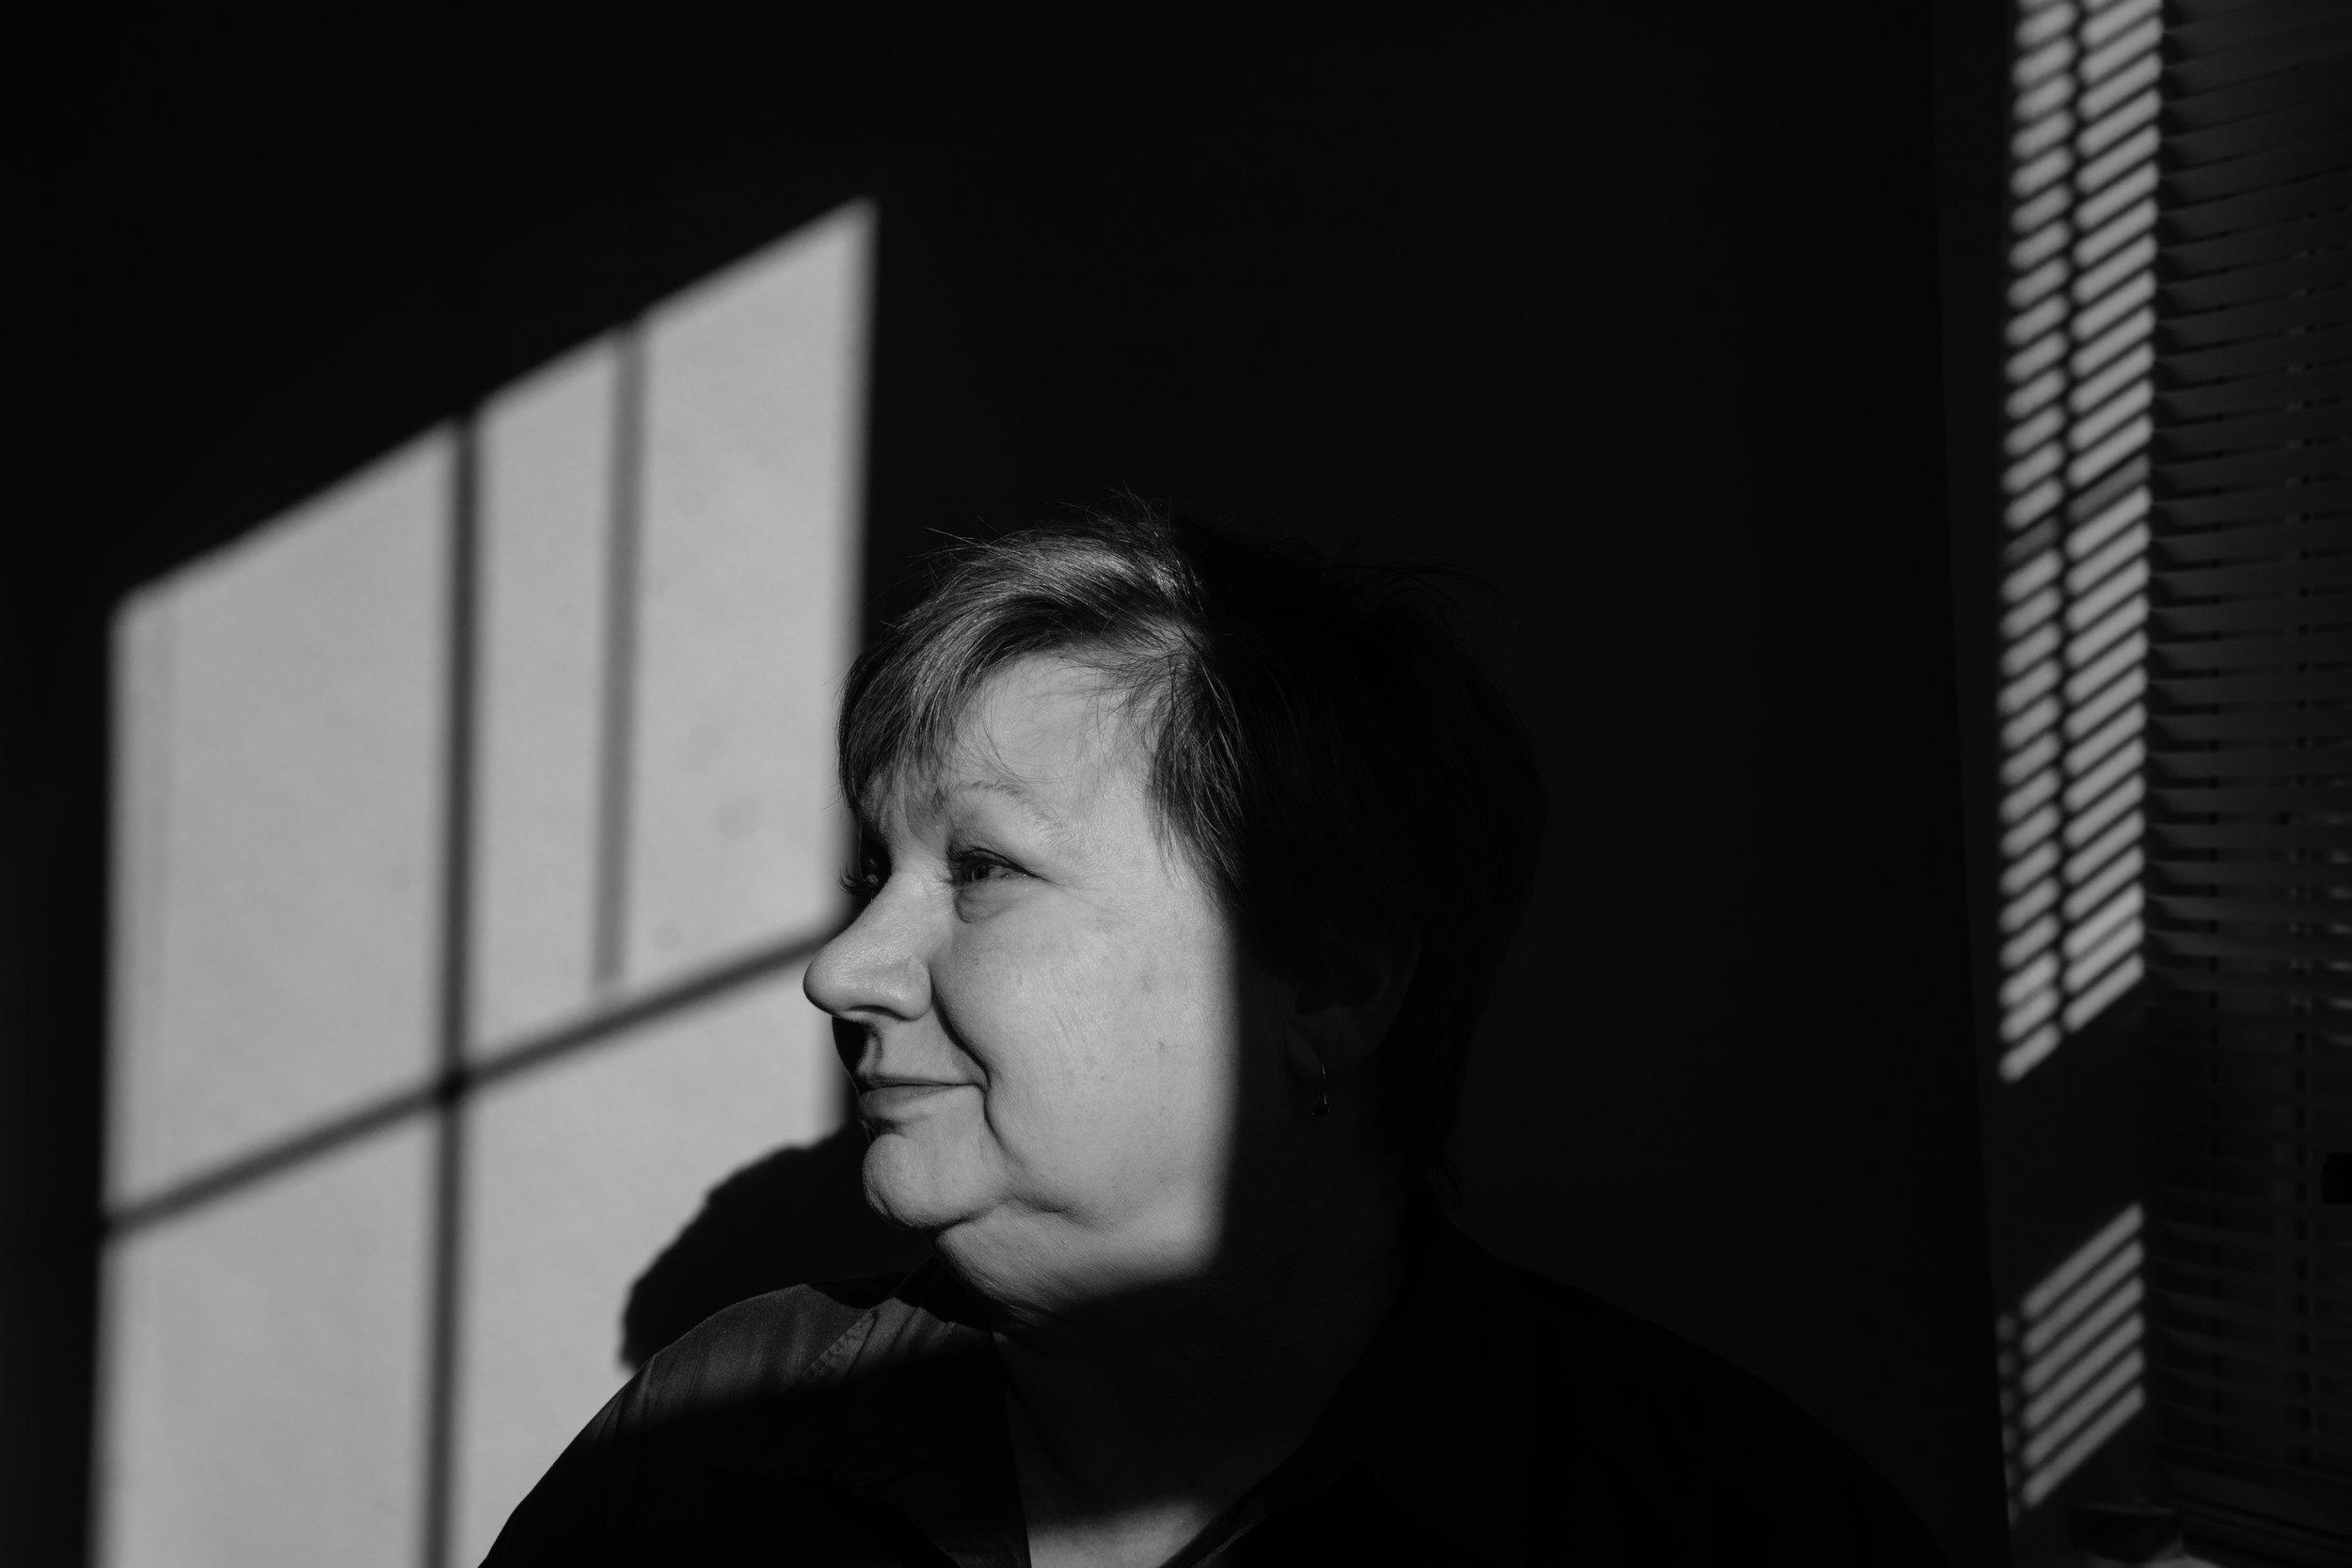 CityBureau-RJCC-Mothers-12062017-4 Julie Anderson.JPG